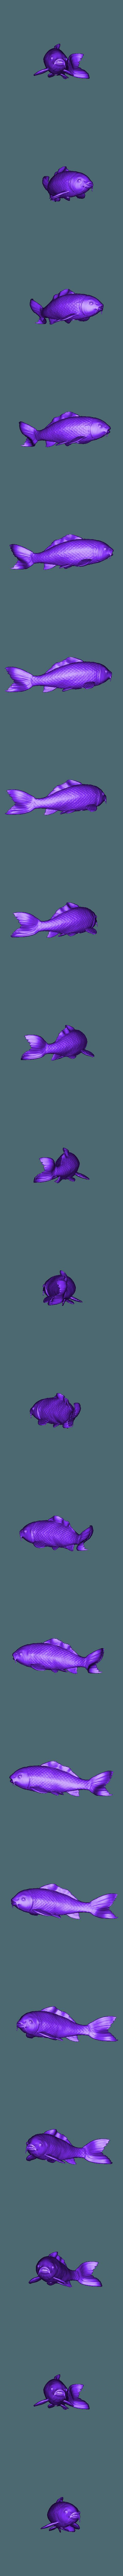 Carp_1.stl Download OBJ file Carp Fancy • Object to 3D print, Dynastinae